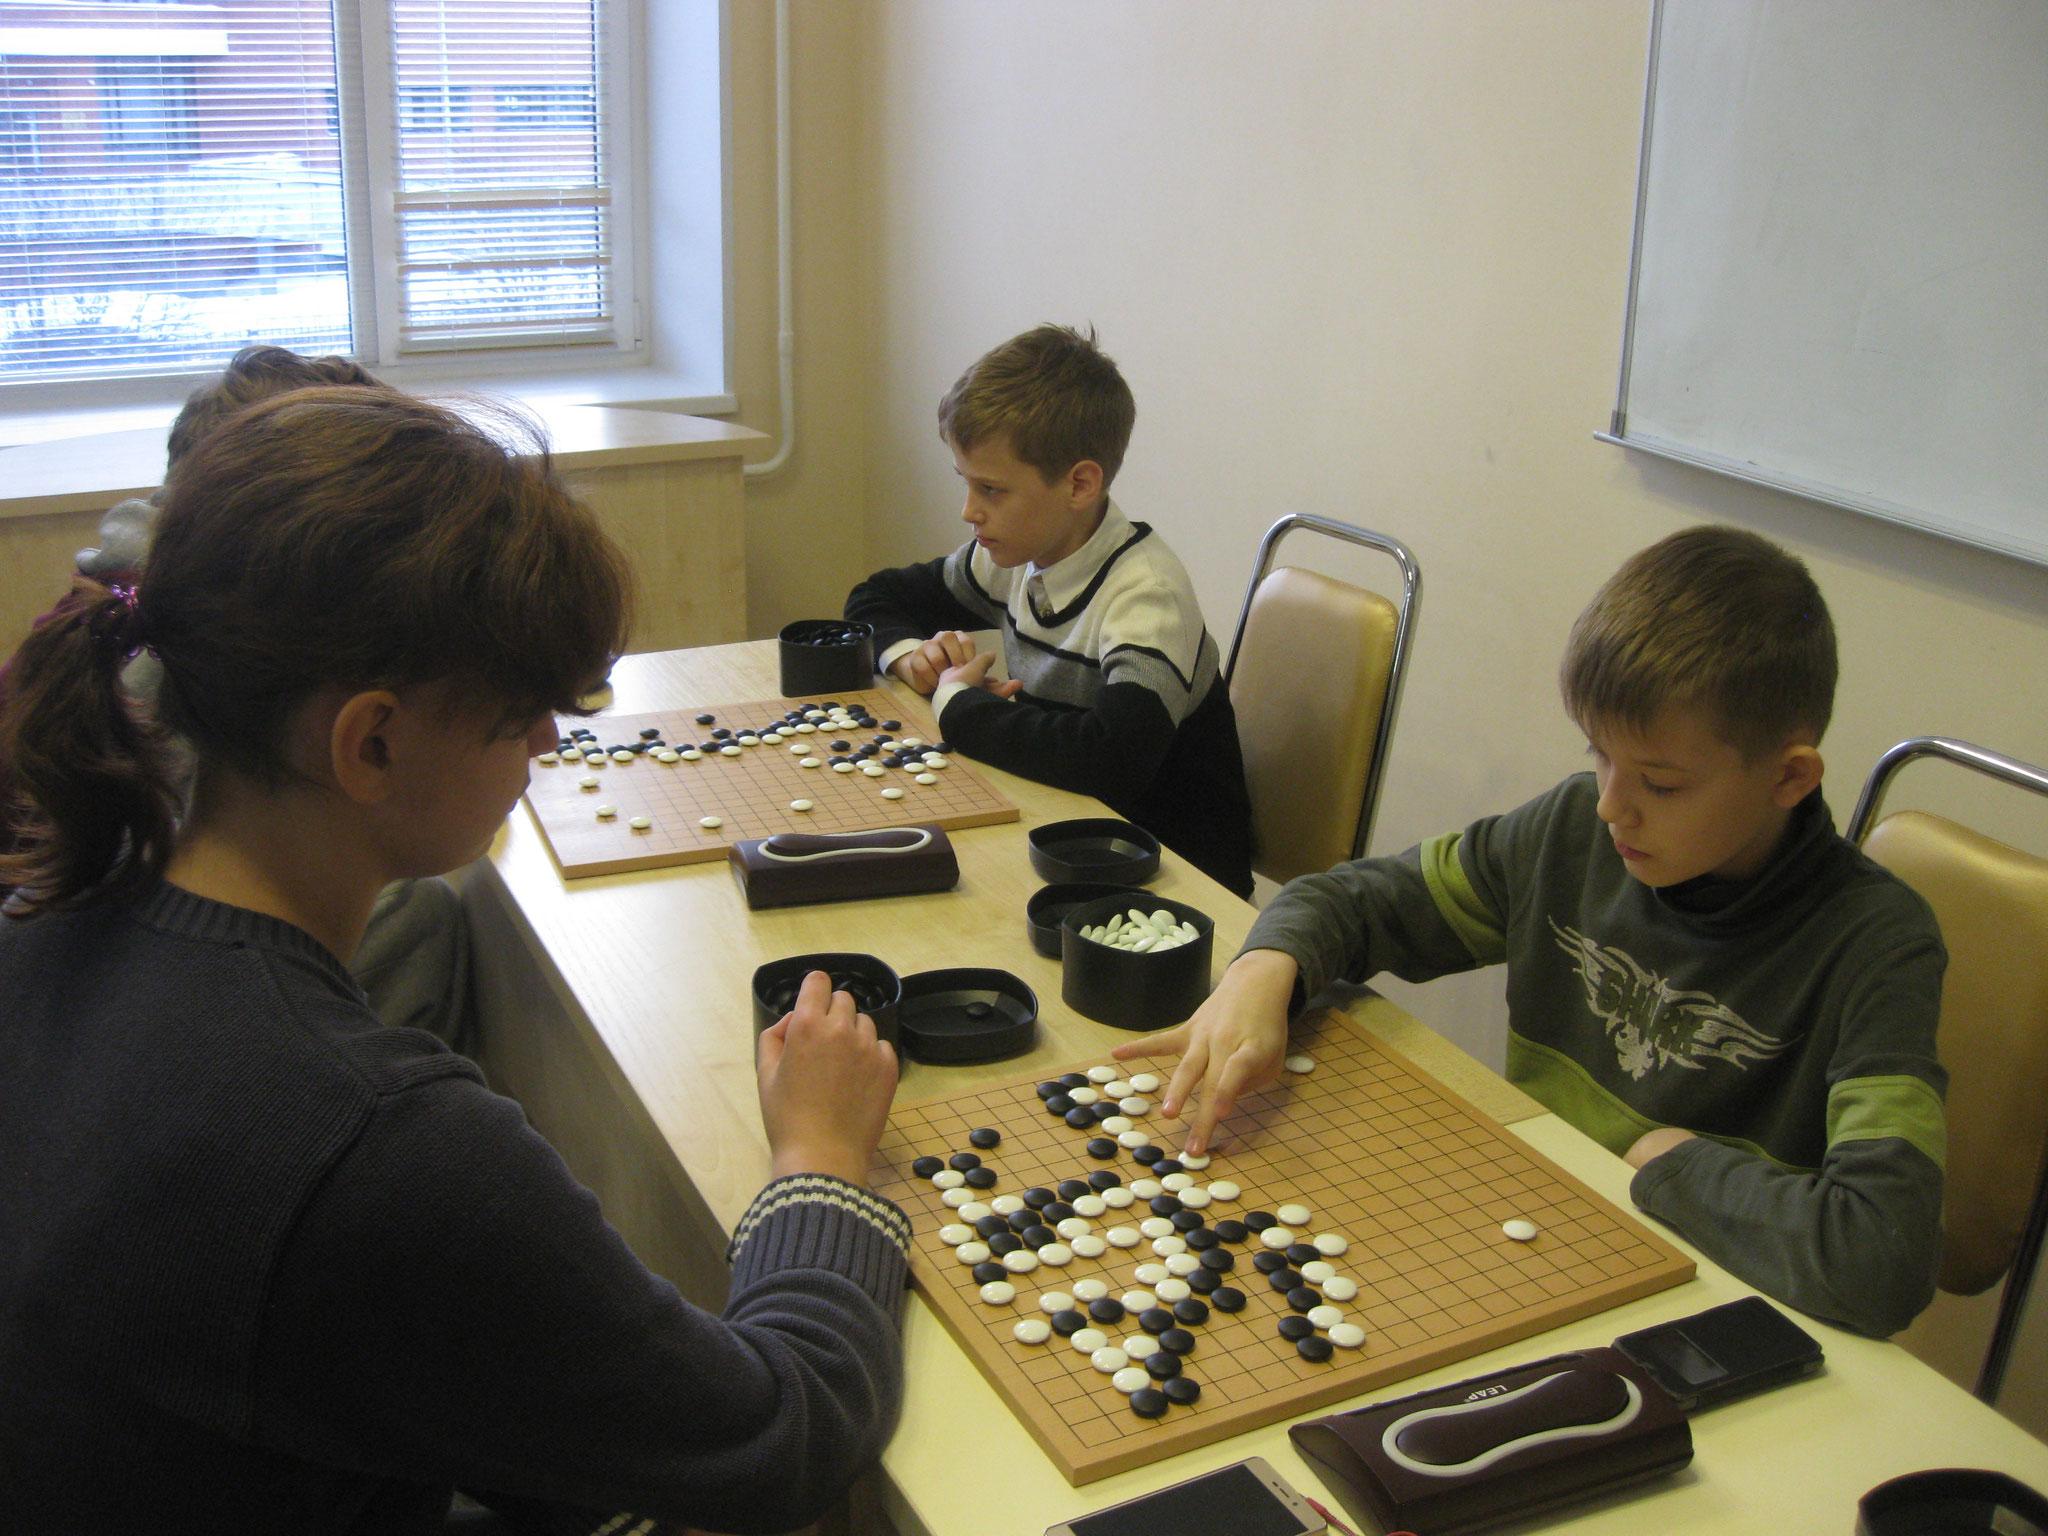 Георгий Захаров (5 кл), Доскал Никита (6 кл)